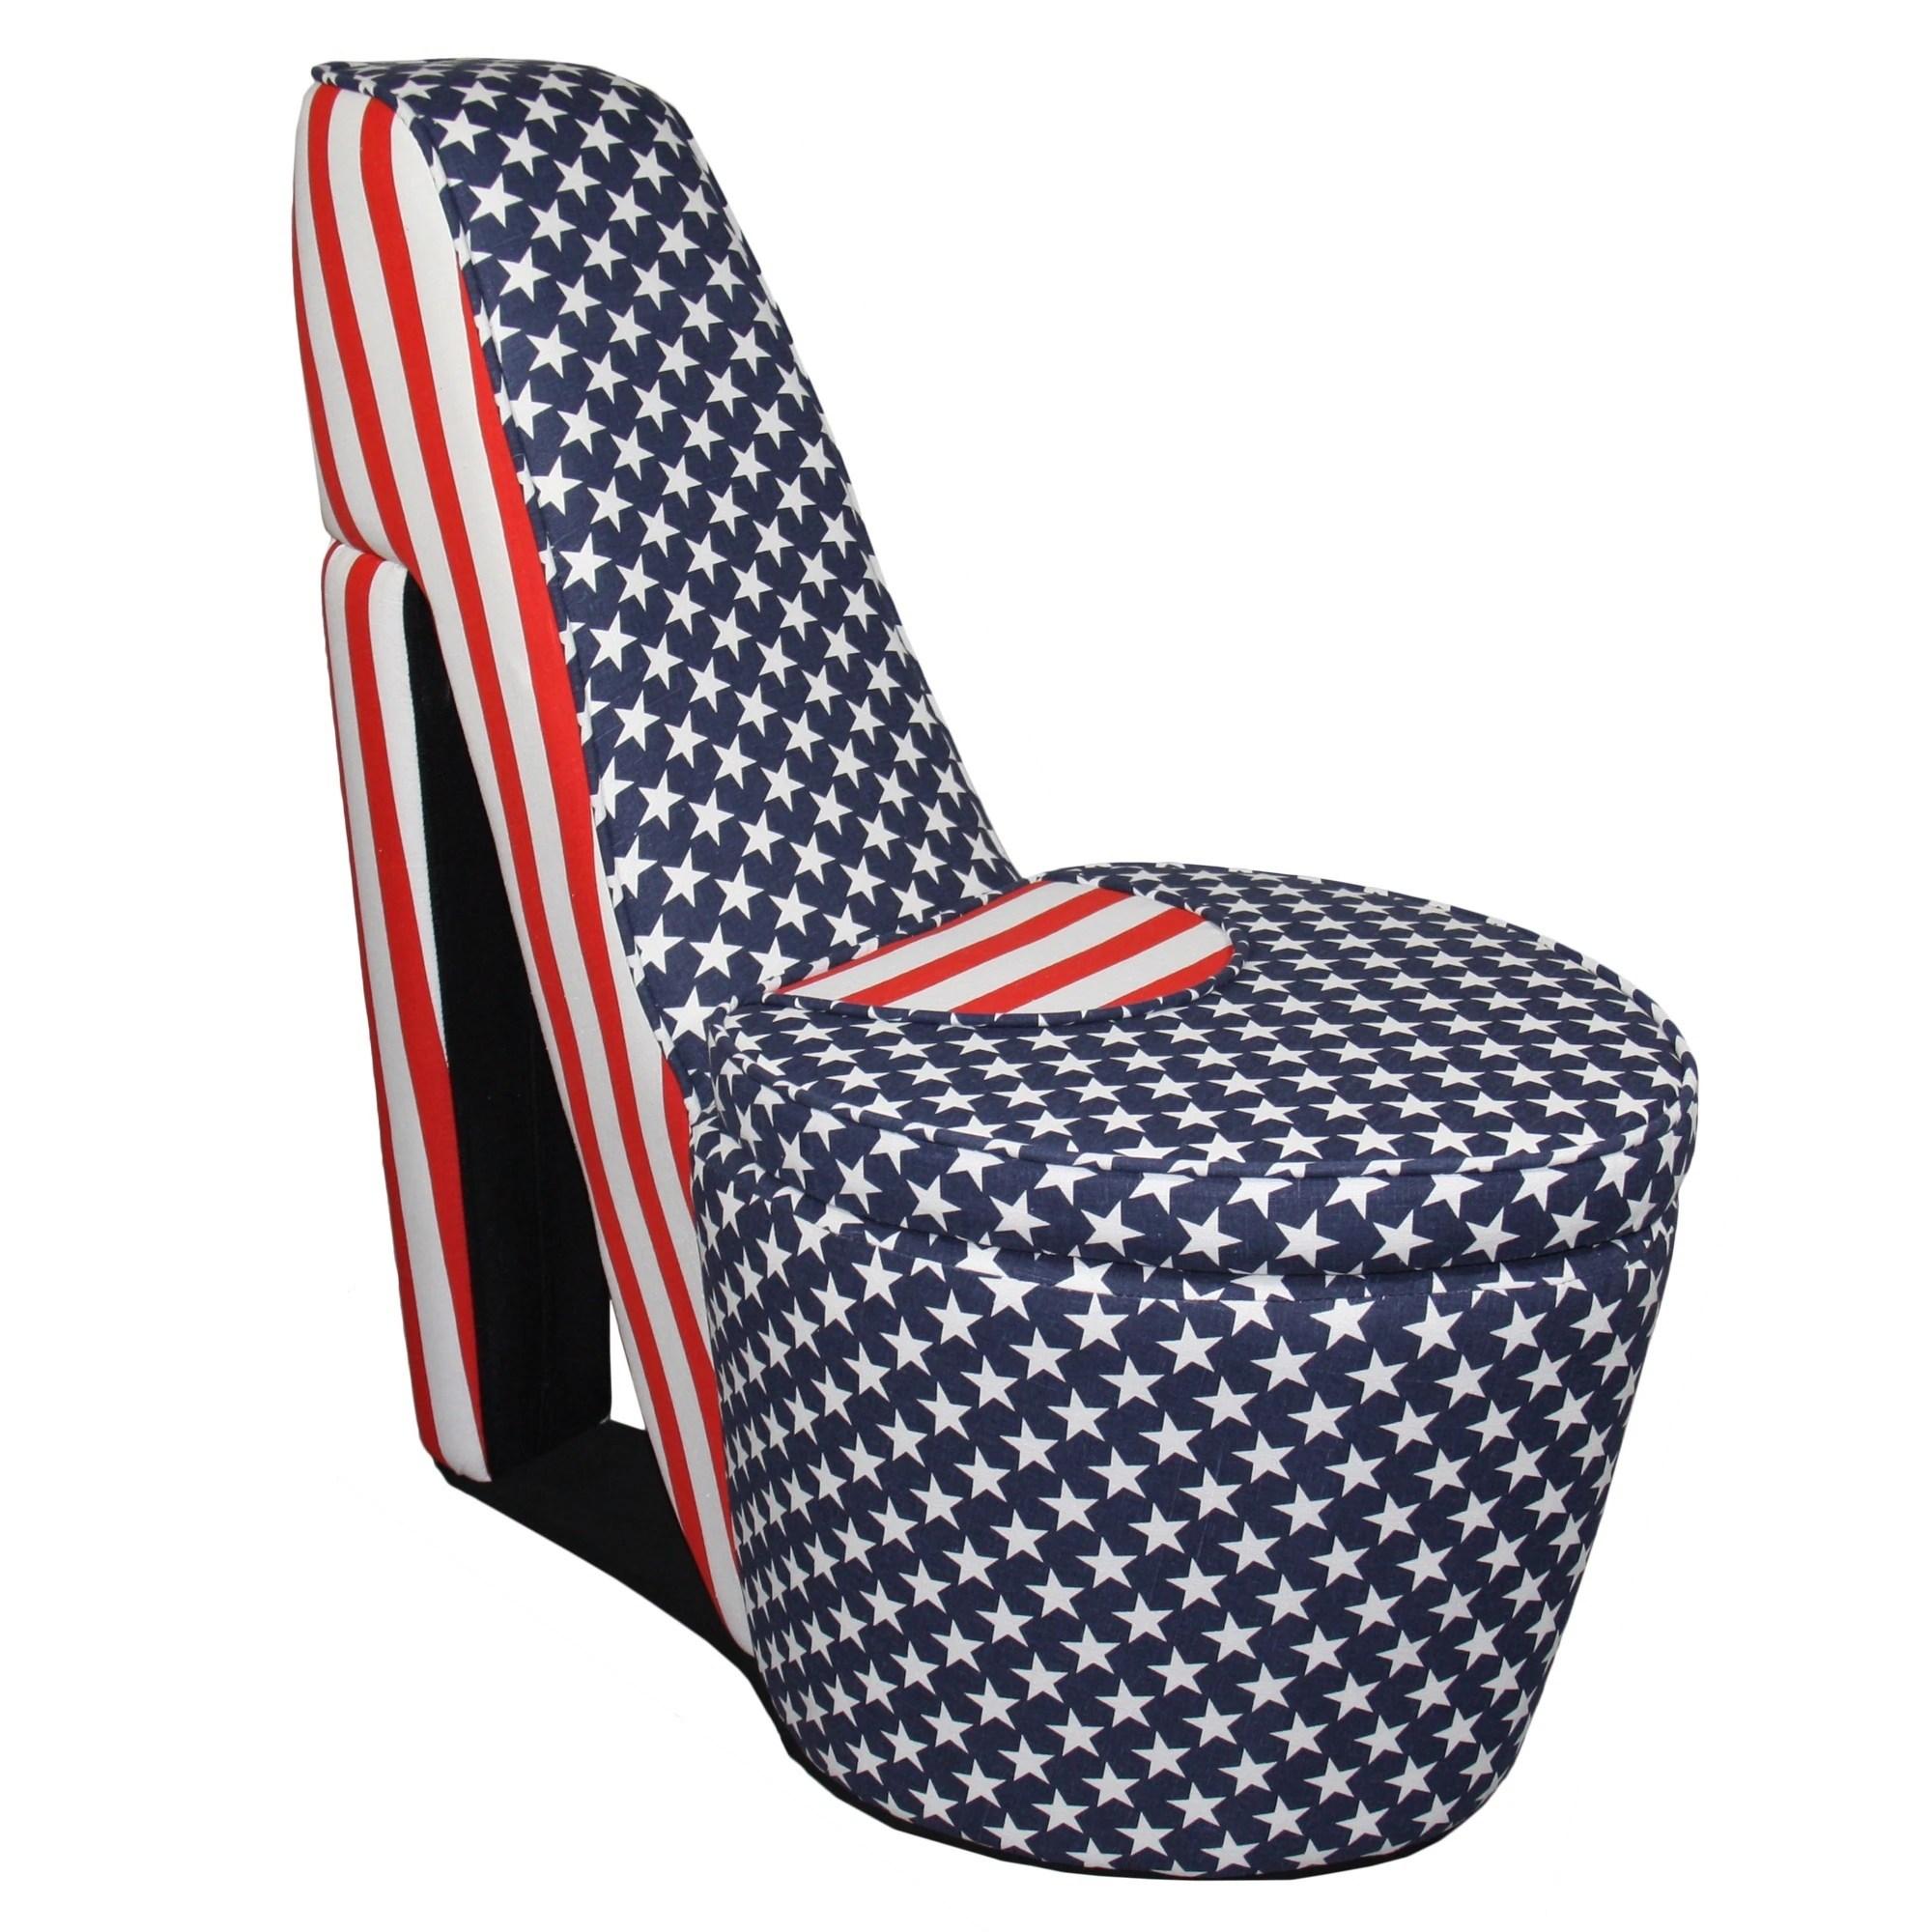 american flag chair electric recliner lift high heels storage ebay